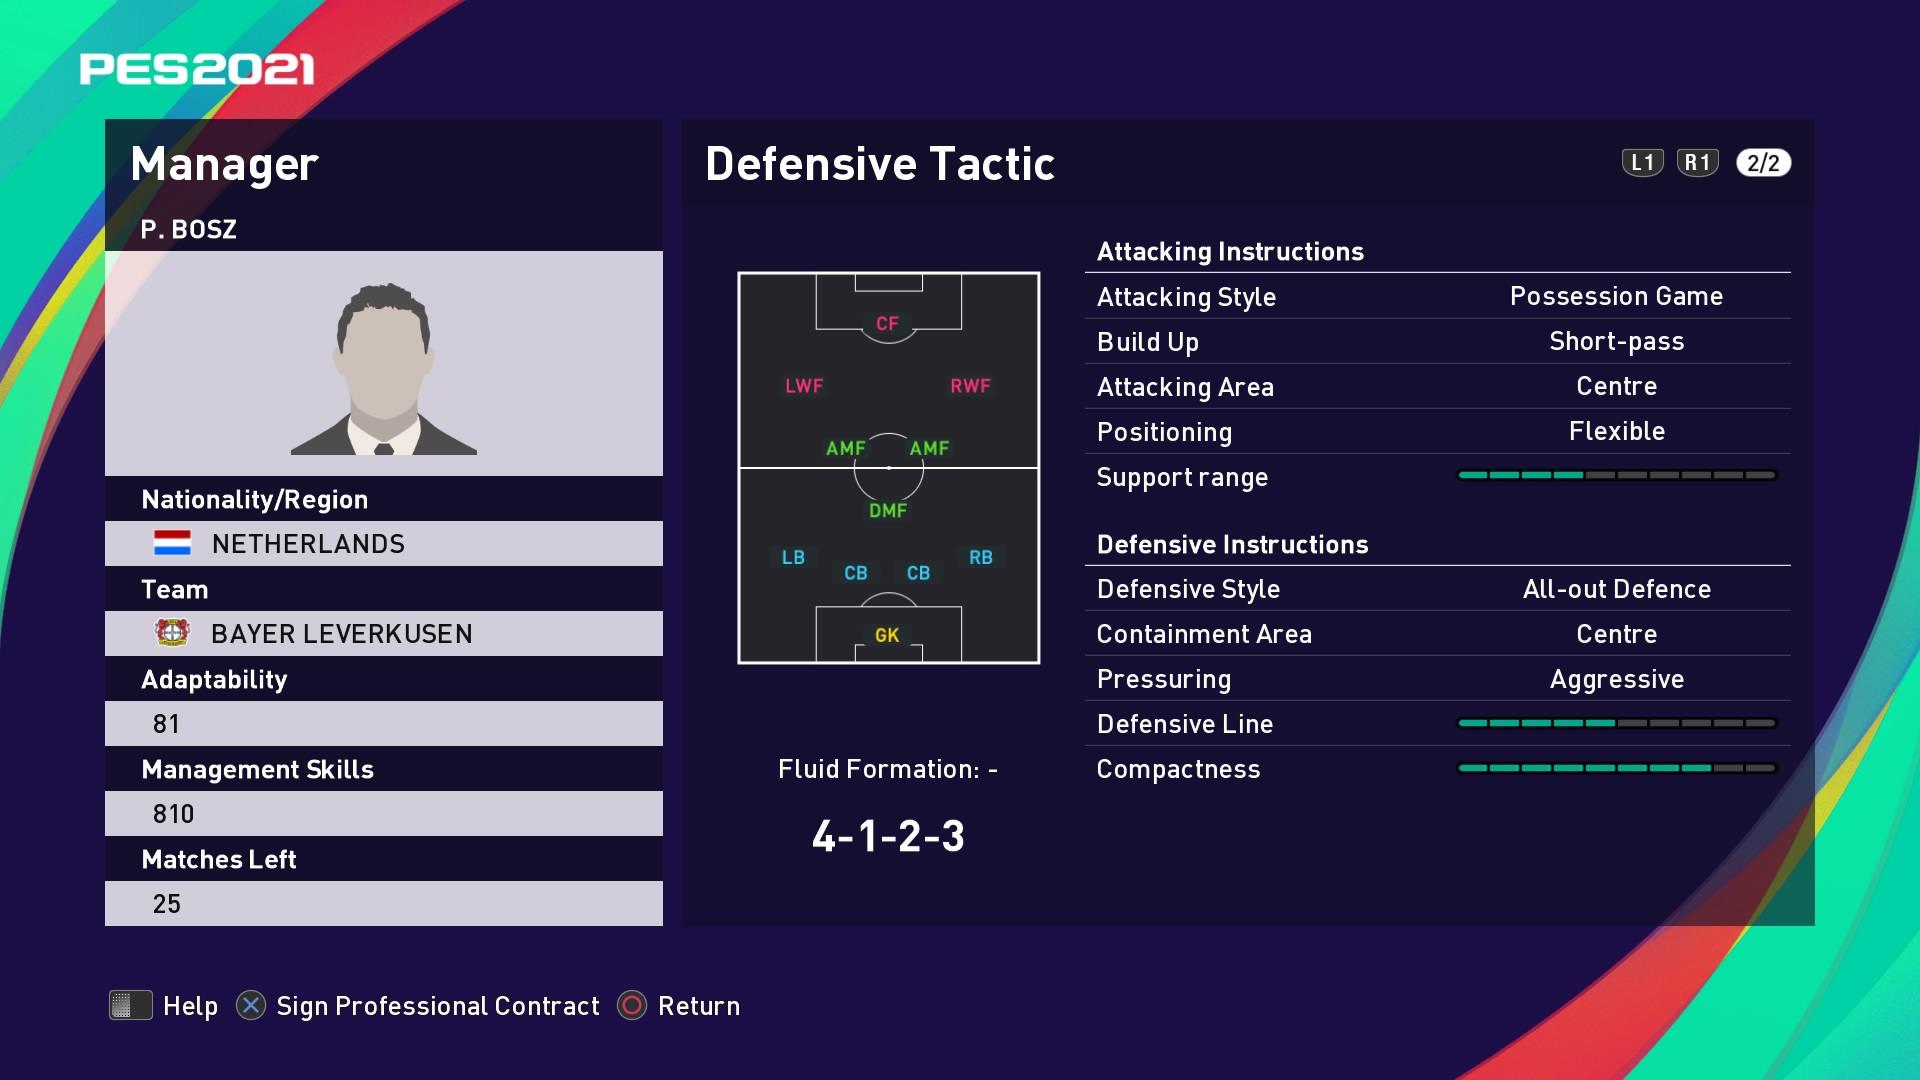 P. Bosz (2) (Peter Bosz) Defensive Tactic in PES 2021 myClub